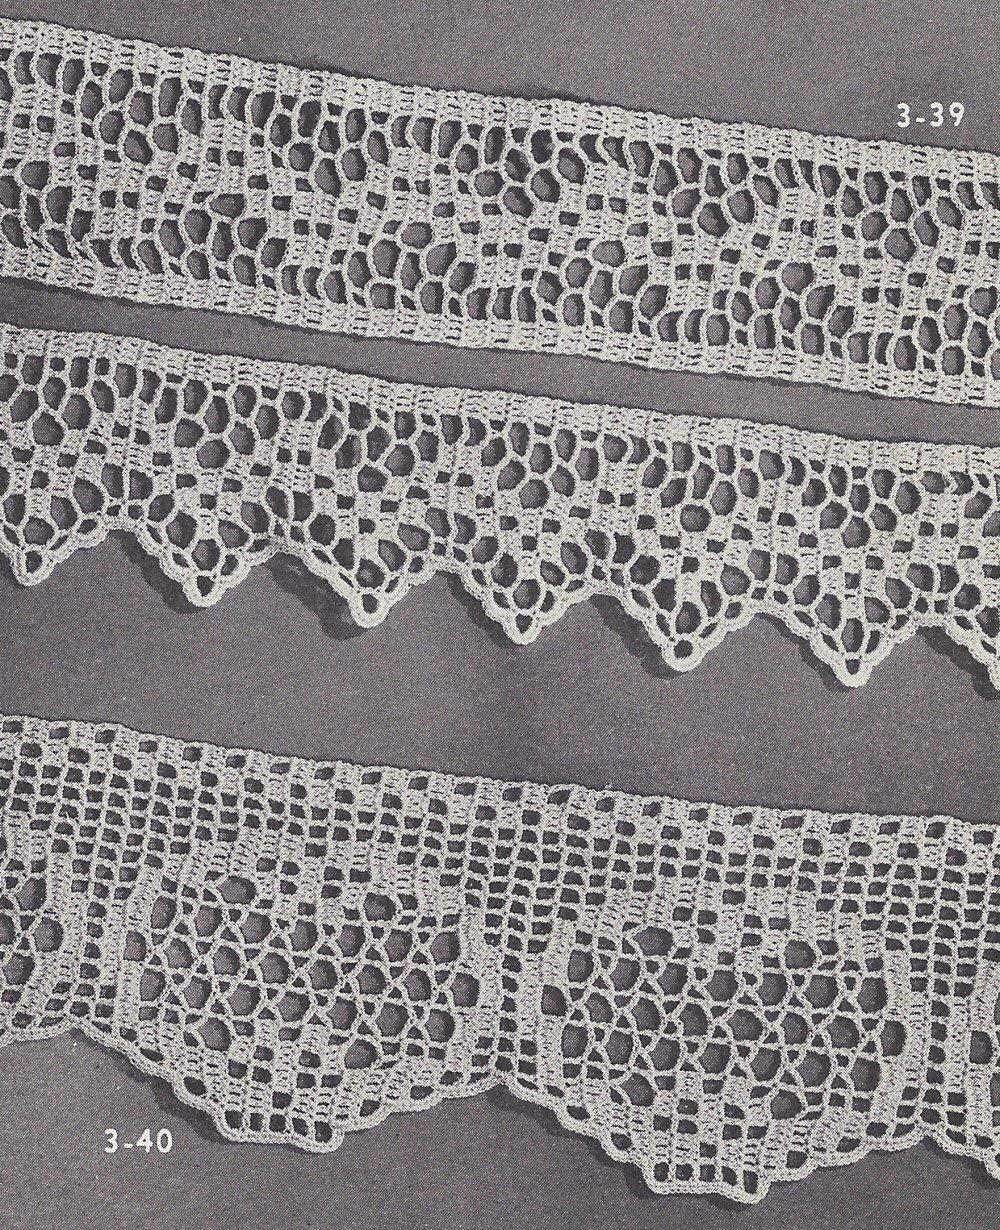 Cheap Crochet Lace Edging Patterns Find Crochet Lace Edging